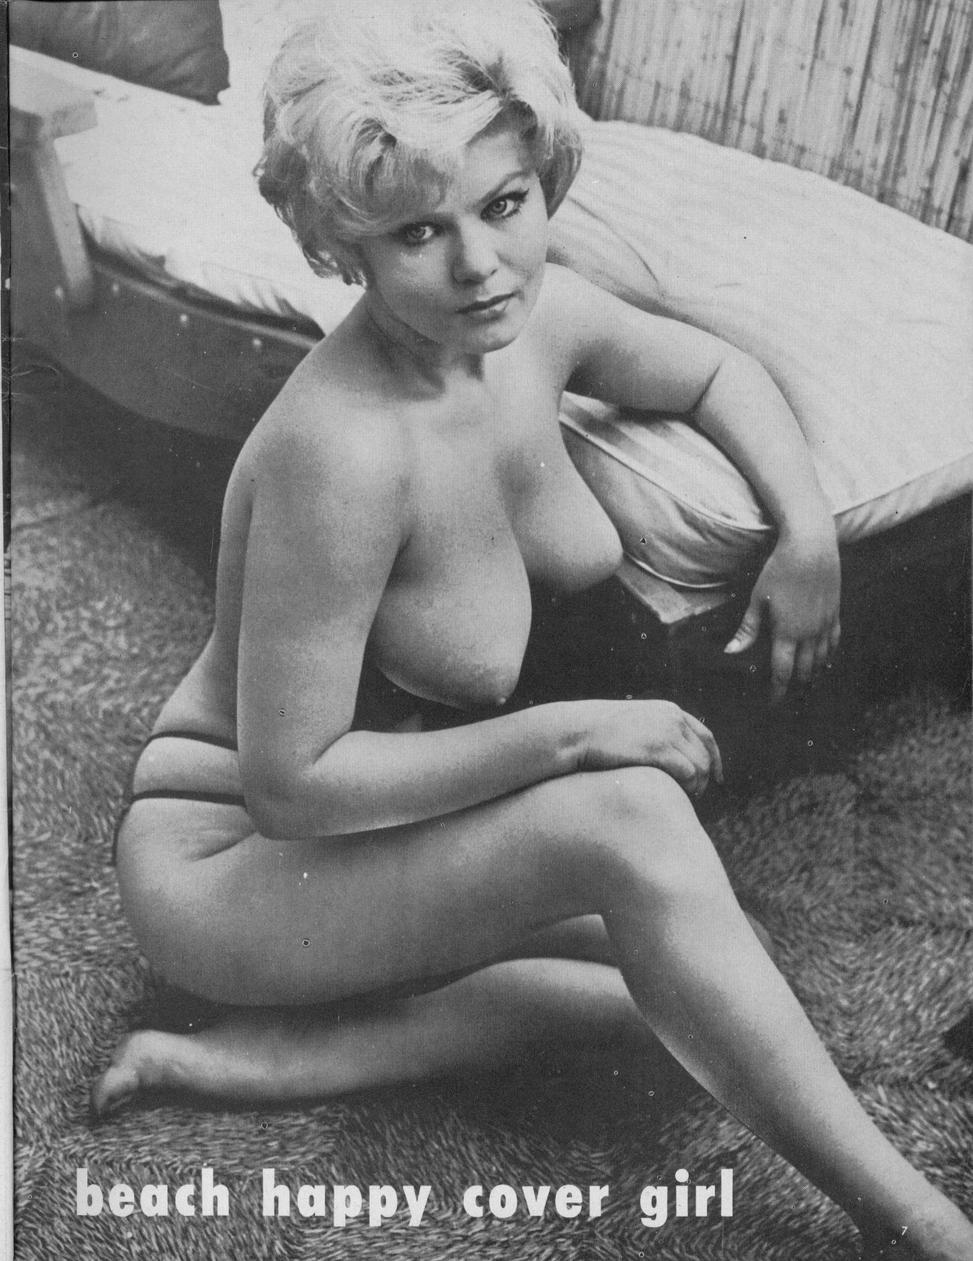 Brando novak naked, grandfather nude sex